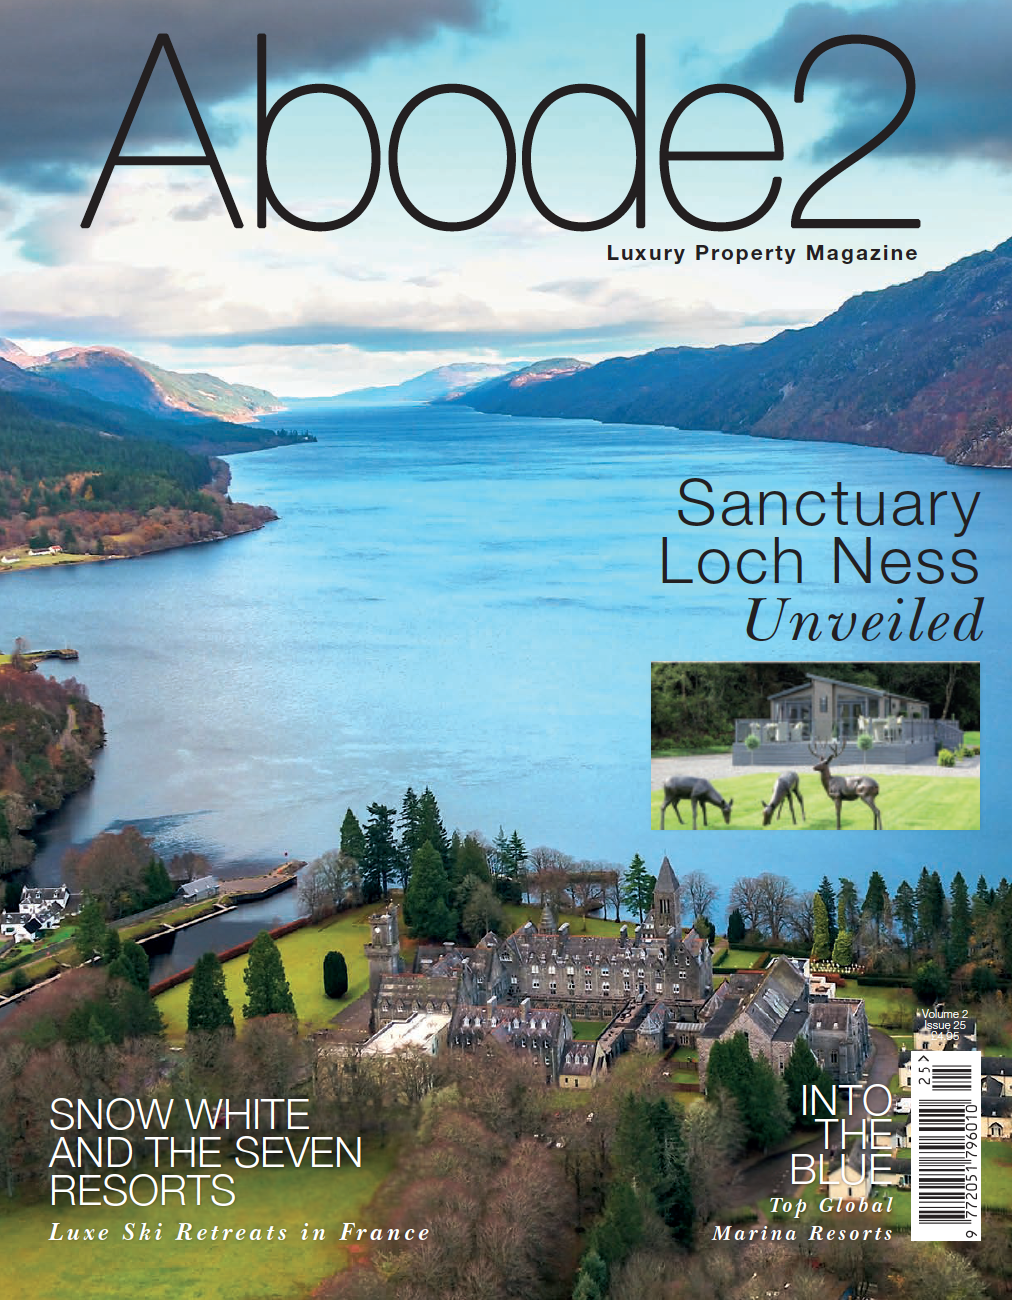 Abode2 magazine featuring high end interior designer Jo Hamilton (front)